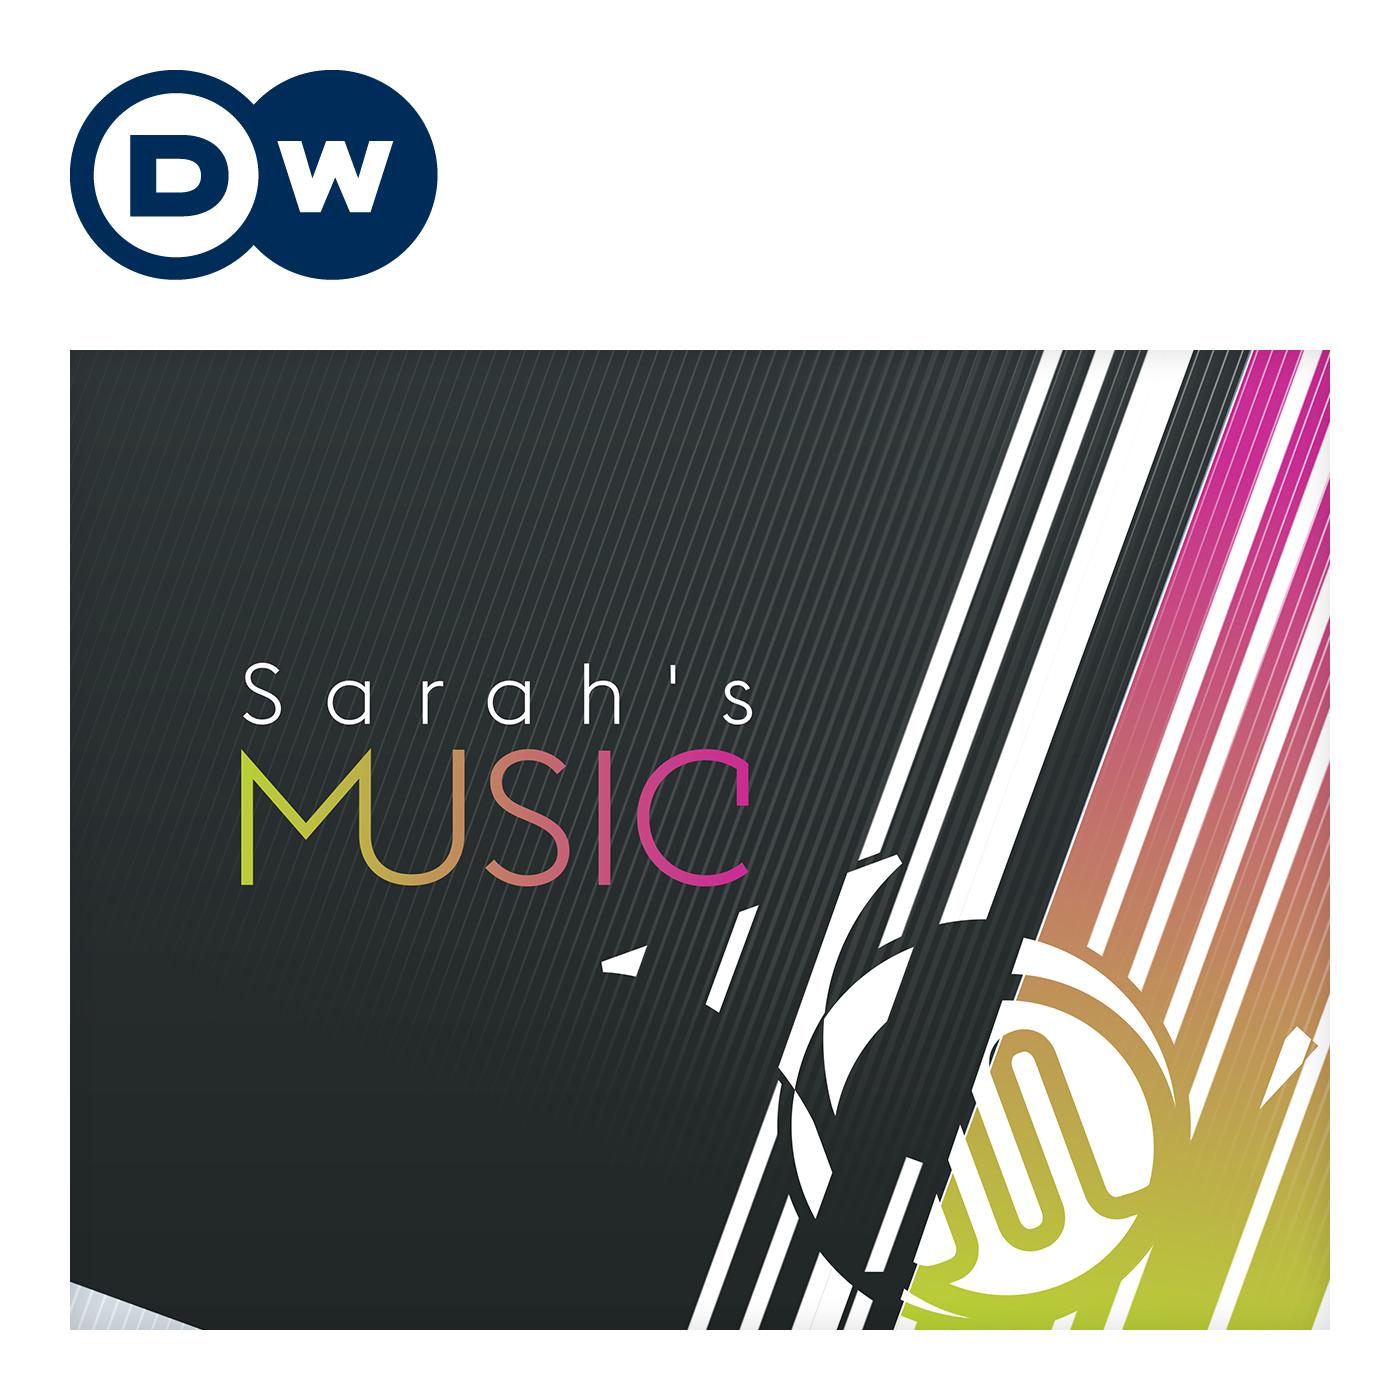 Sarah's Music: Contemporary Classical